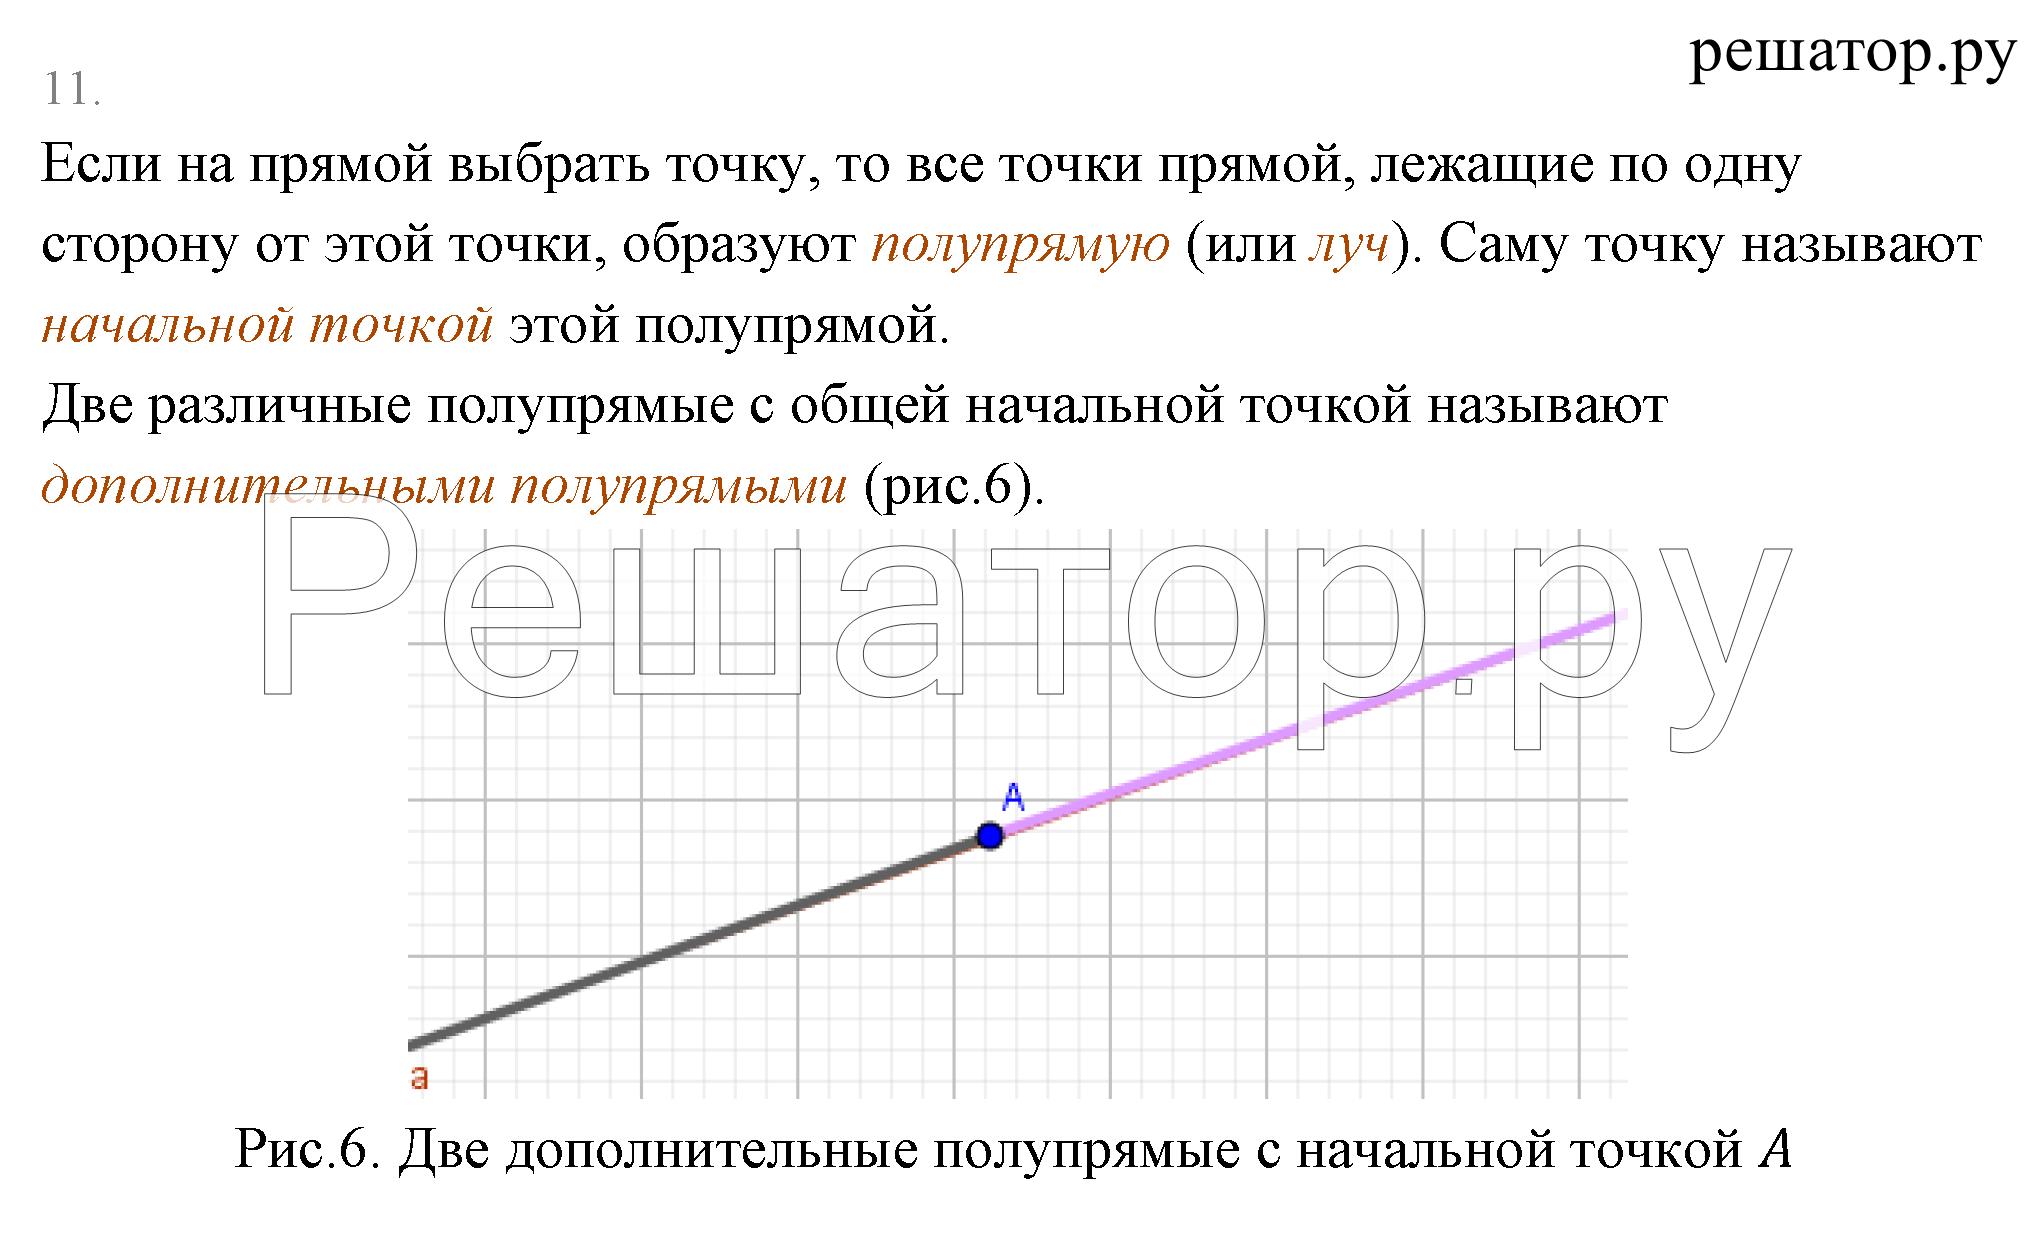 ГДЗ по геометрии класс Погорелов решебник онлайн  Задачи 1 2 3 4 5 6 7 8 9 10 11 12